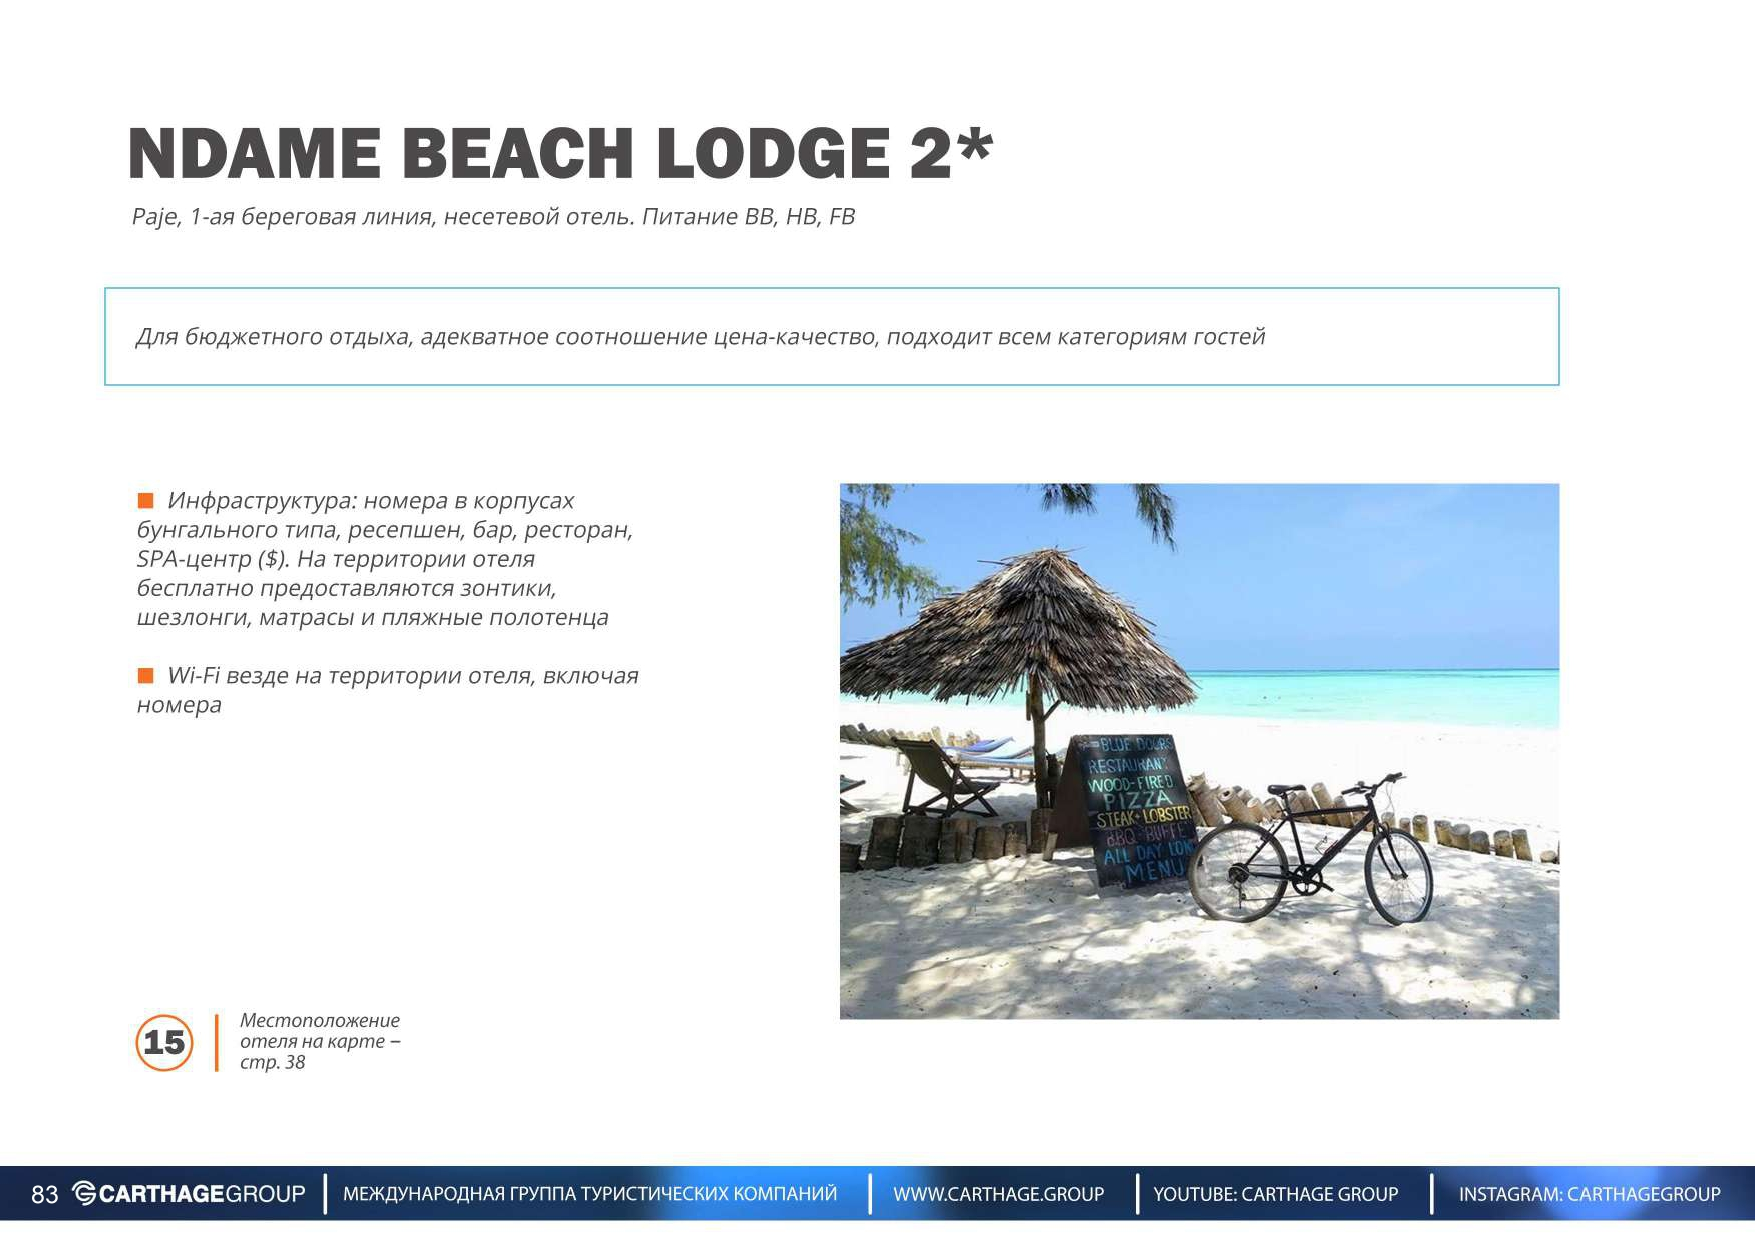 27.11 - Zanzibar Presentation 2020-2021_page-0083